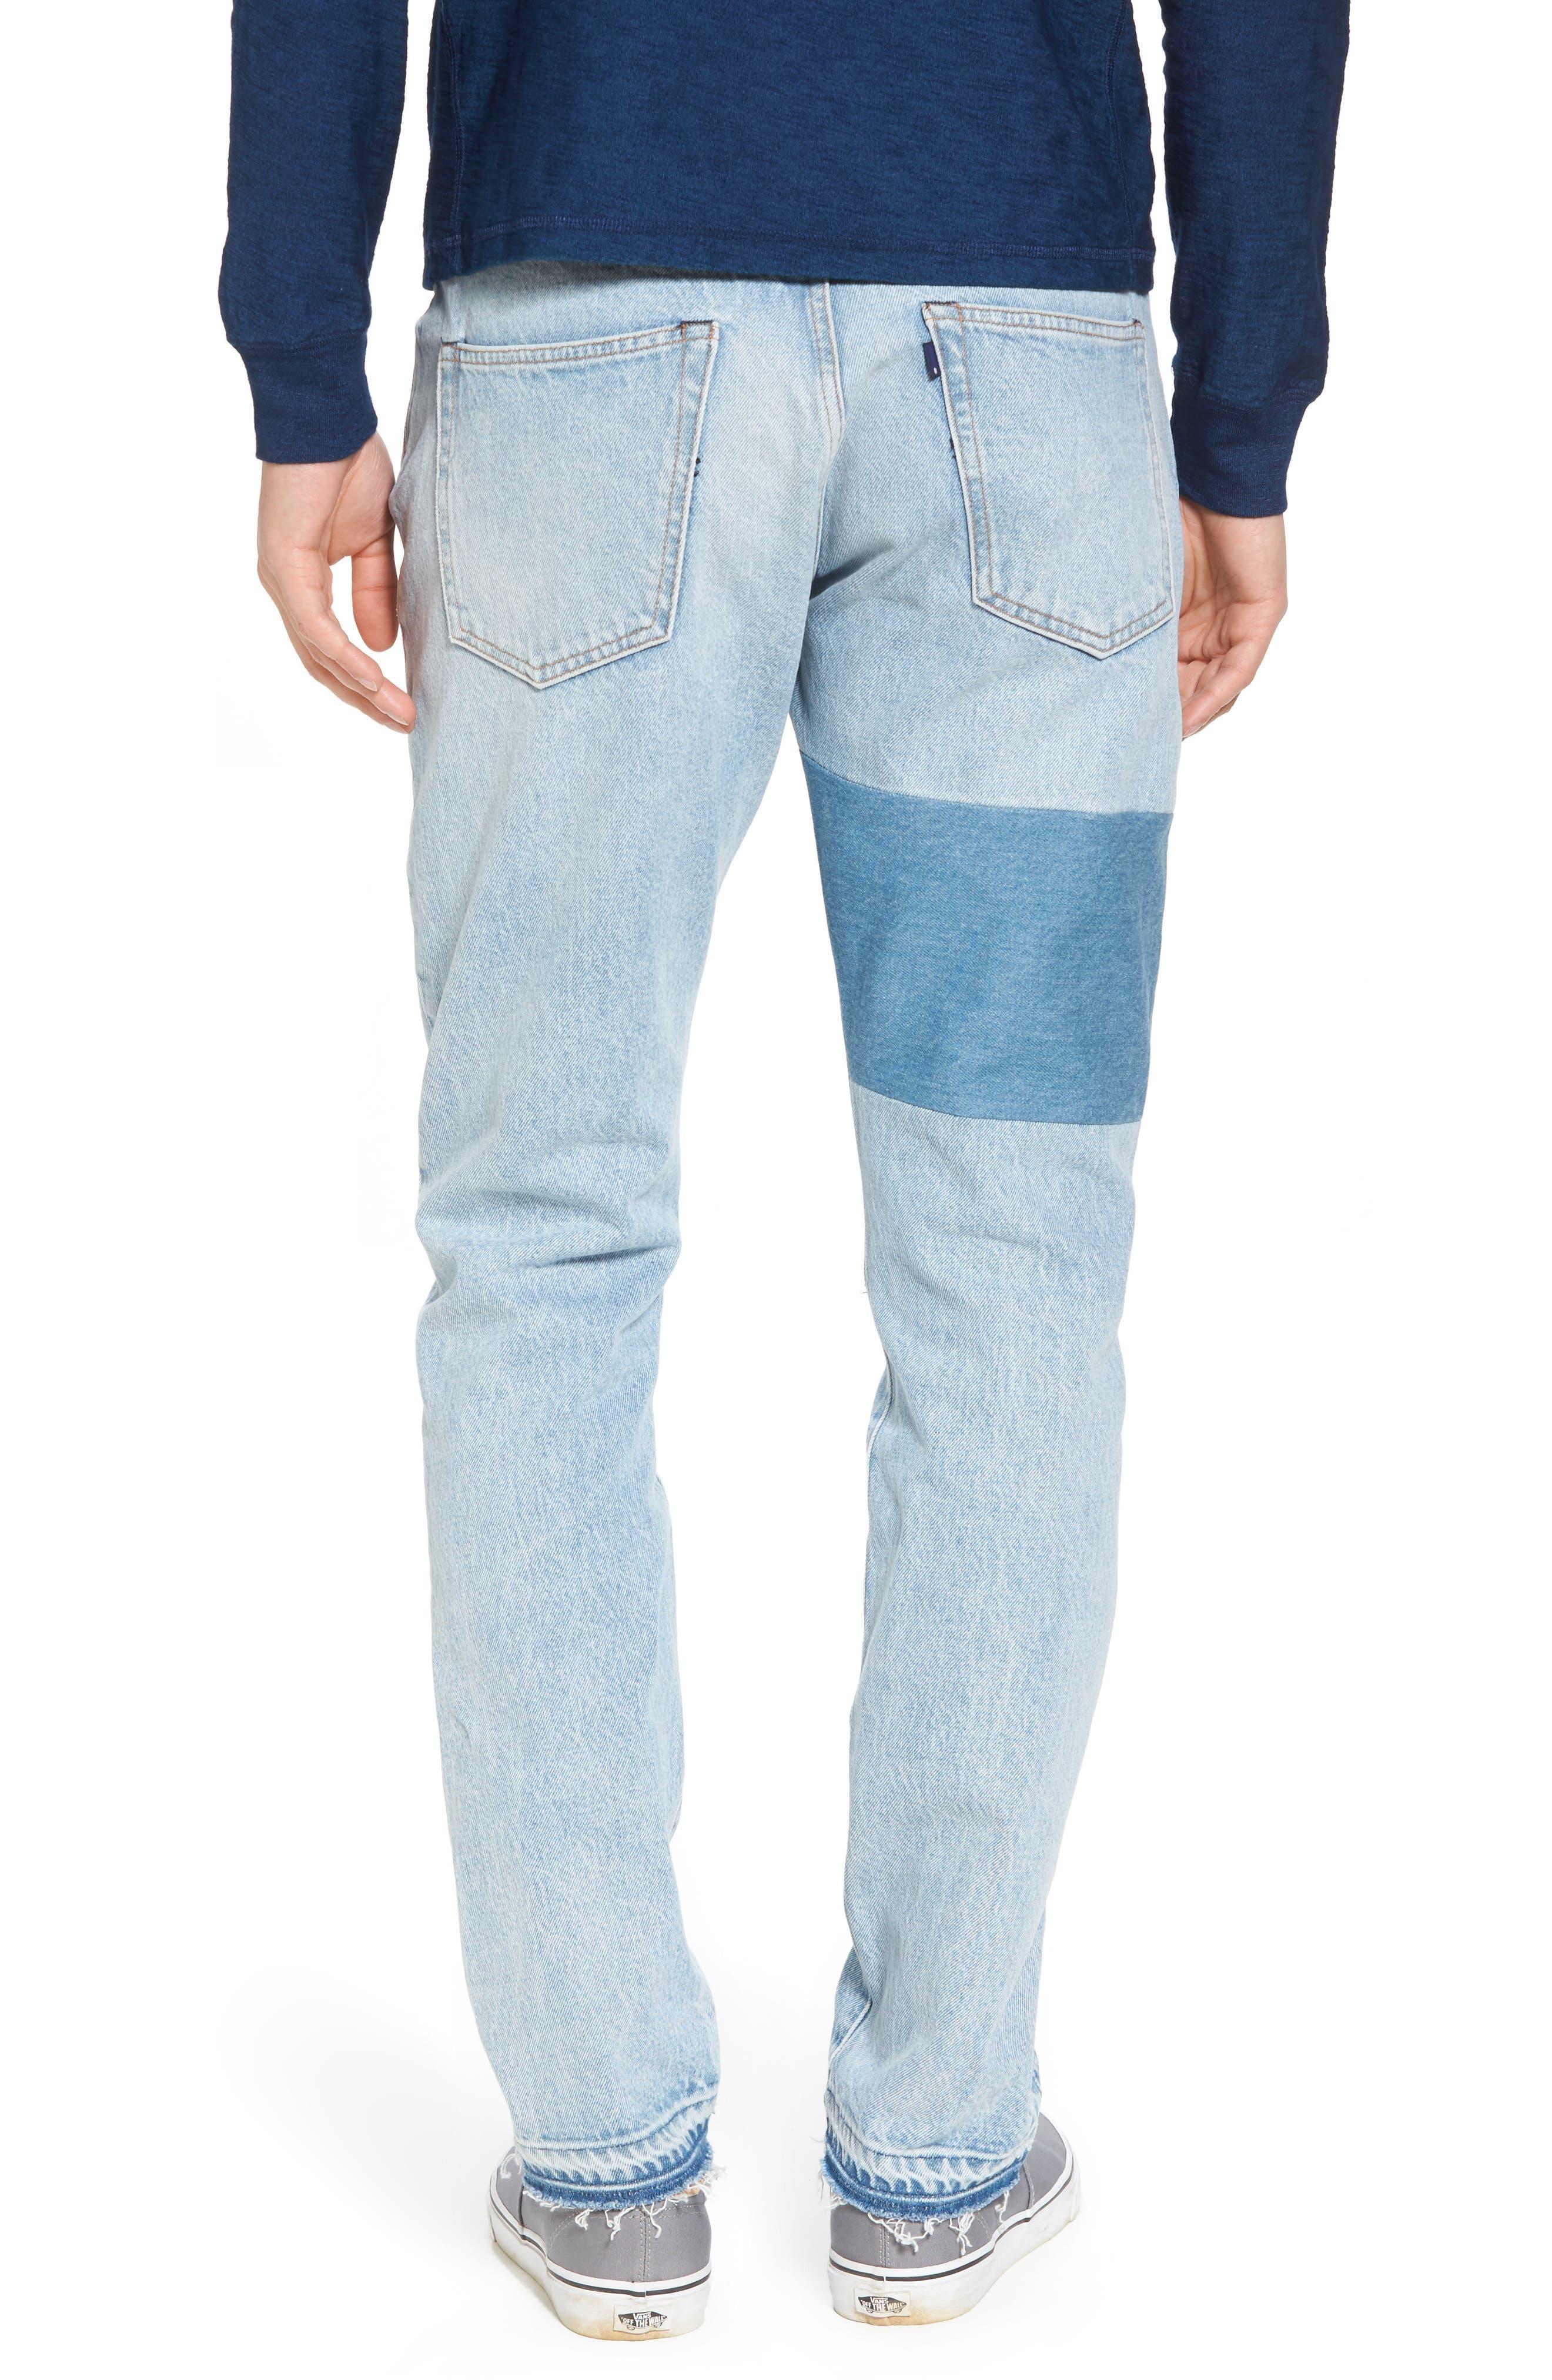 Studio Slim Fit Jeans,                             Alternate thumbnail 2, color,                             420